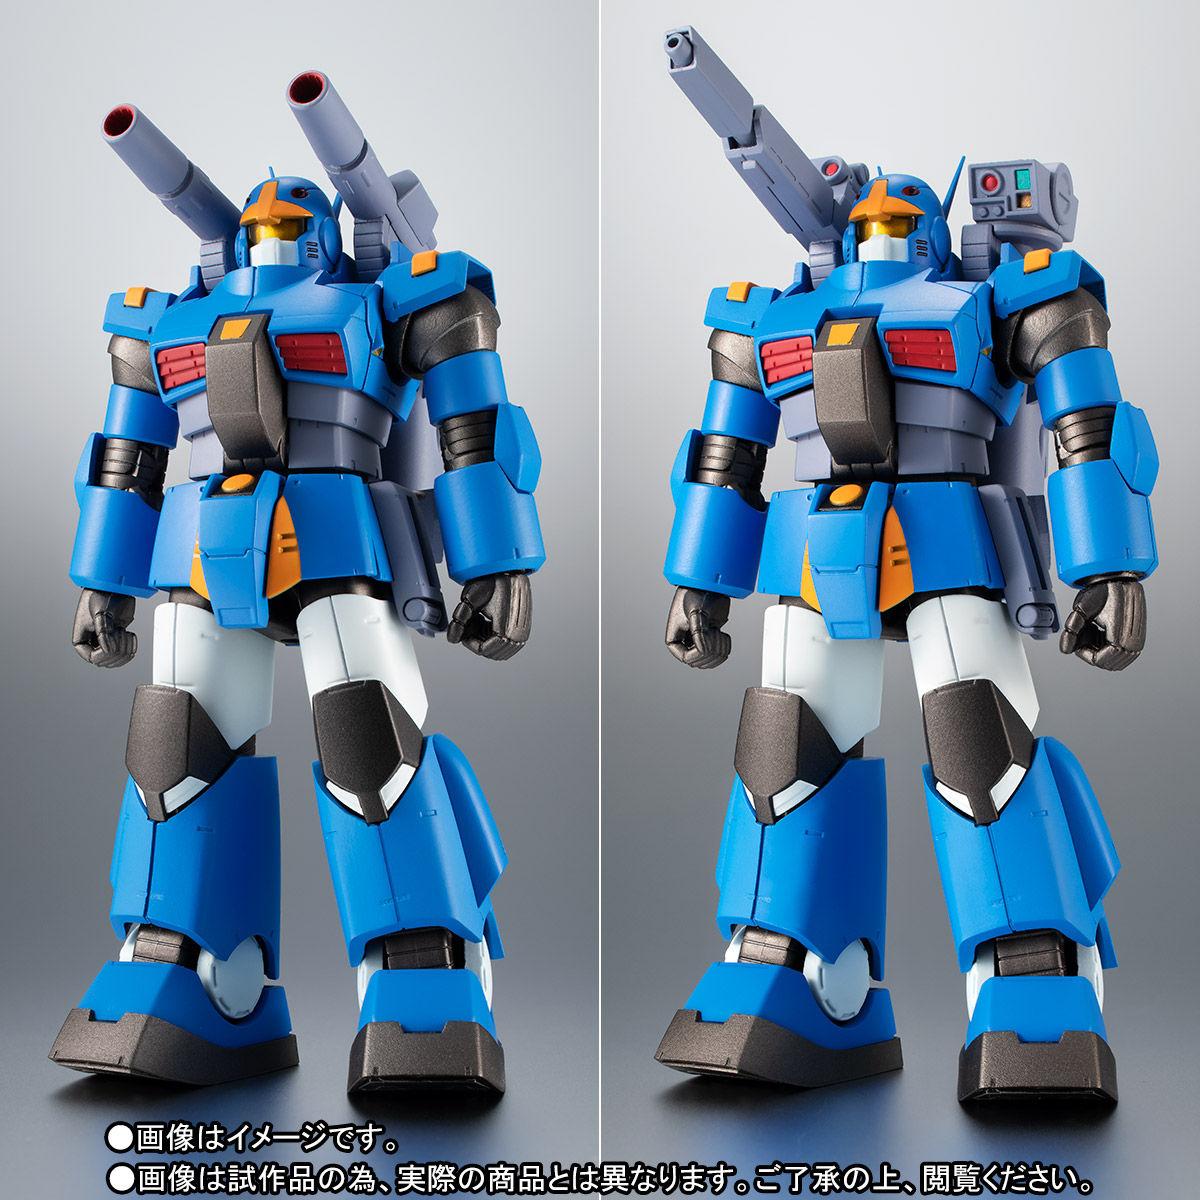 ROBOT魂〈SIDE MS〉『RX-77-3 ガンキャノン重装型 ver. A.N.I.M.E.』ガンダムMSV 可動フィギュア-008